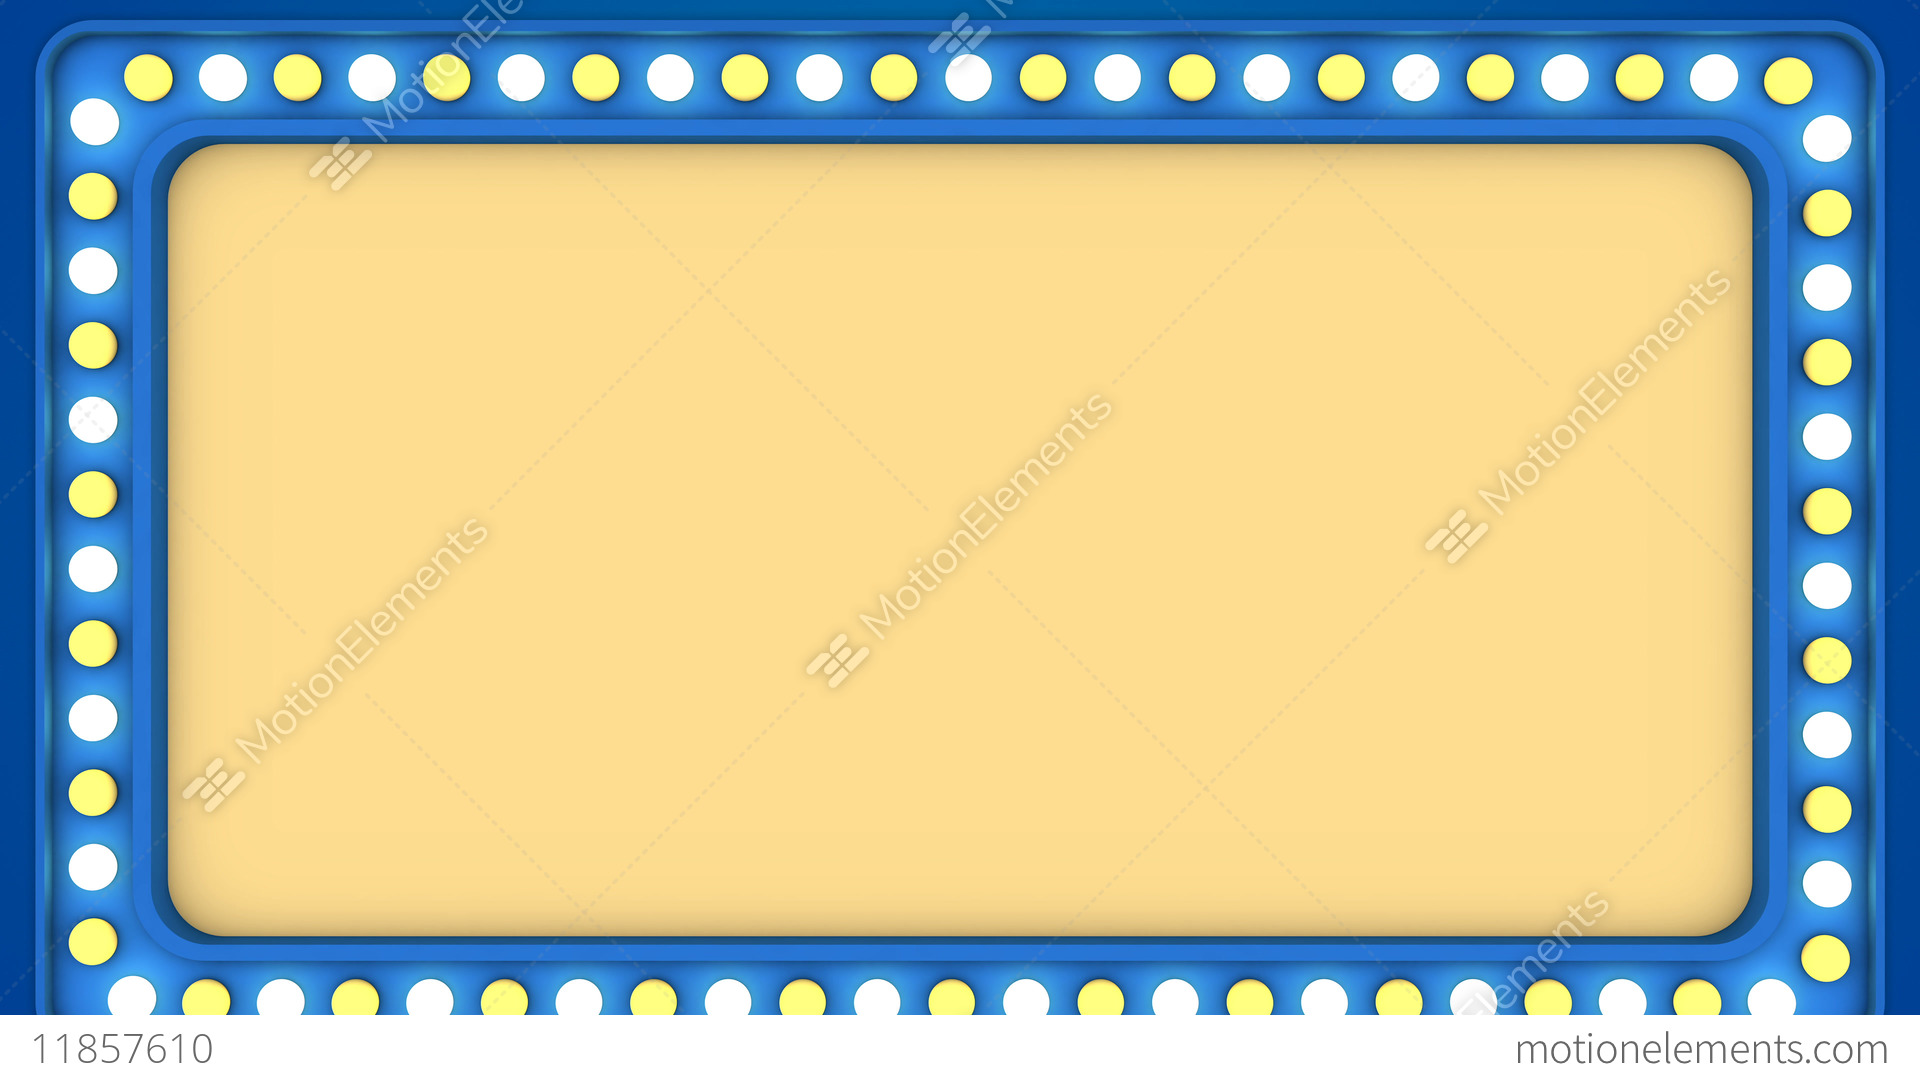 Flashing Light Bulbs Blue Frame Border Screen Sign Stock Video Footage